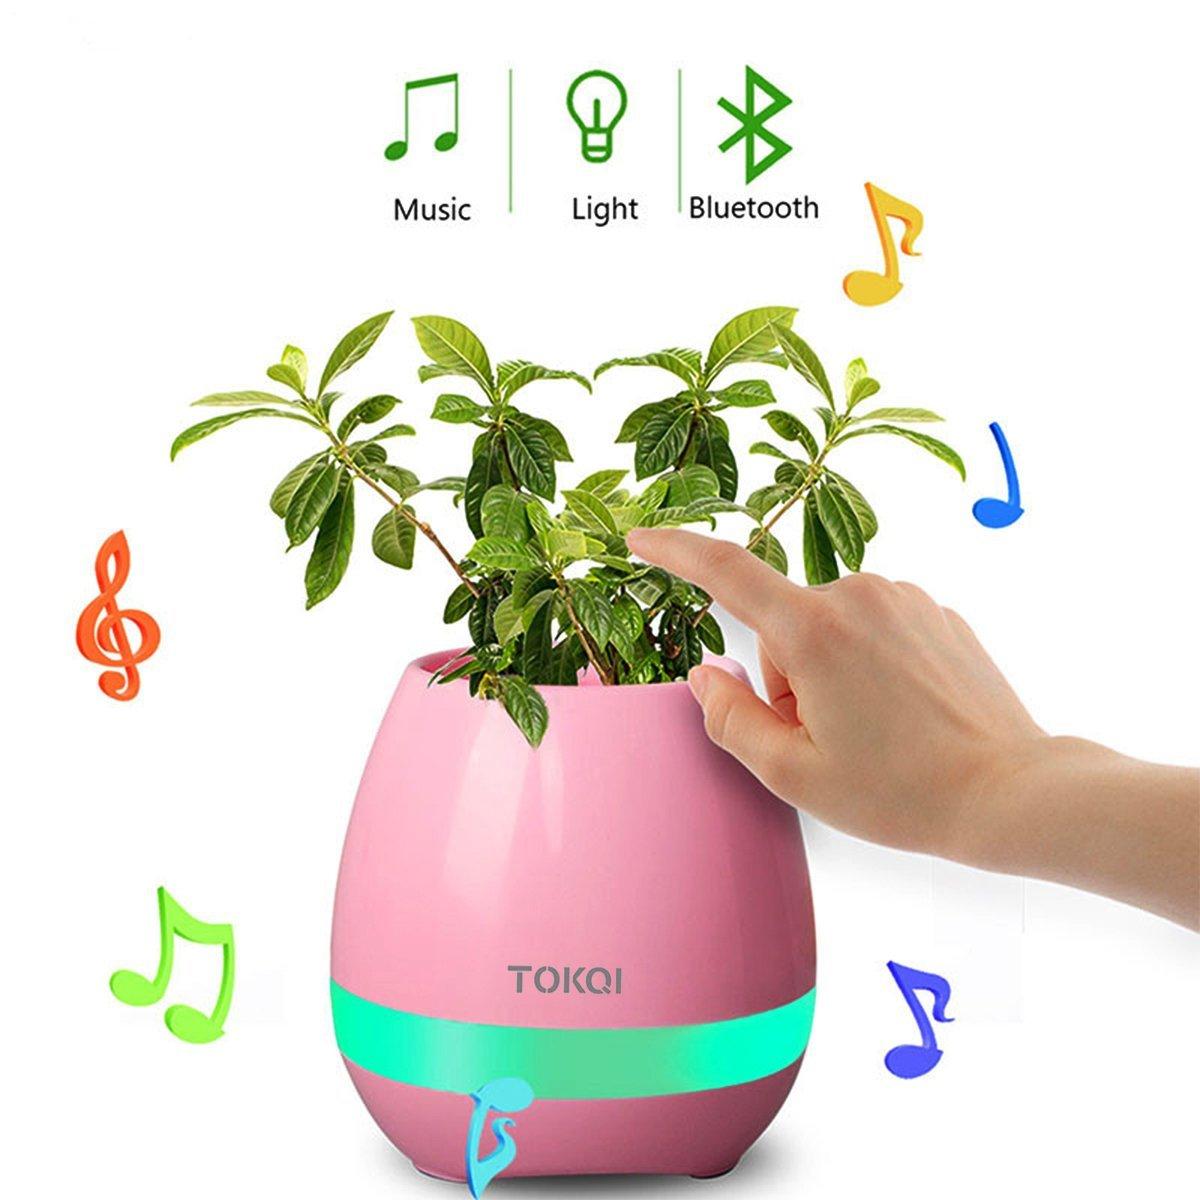 Music Flower Pot Speaker Smart Wireless Finger Bluetooth Switch Office Living Room Decoration Home Speaker Desk Touch Night LED-in Portable Speakers from Consumer Electronics